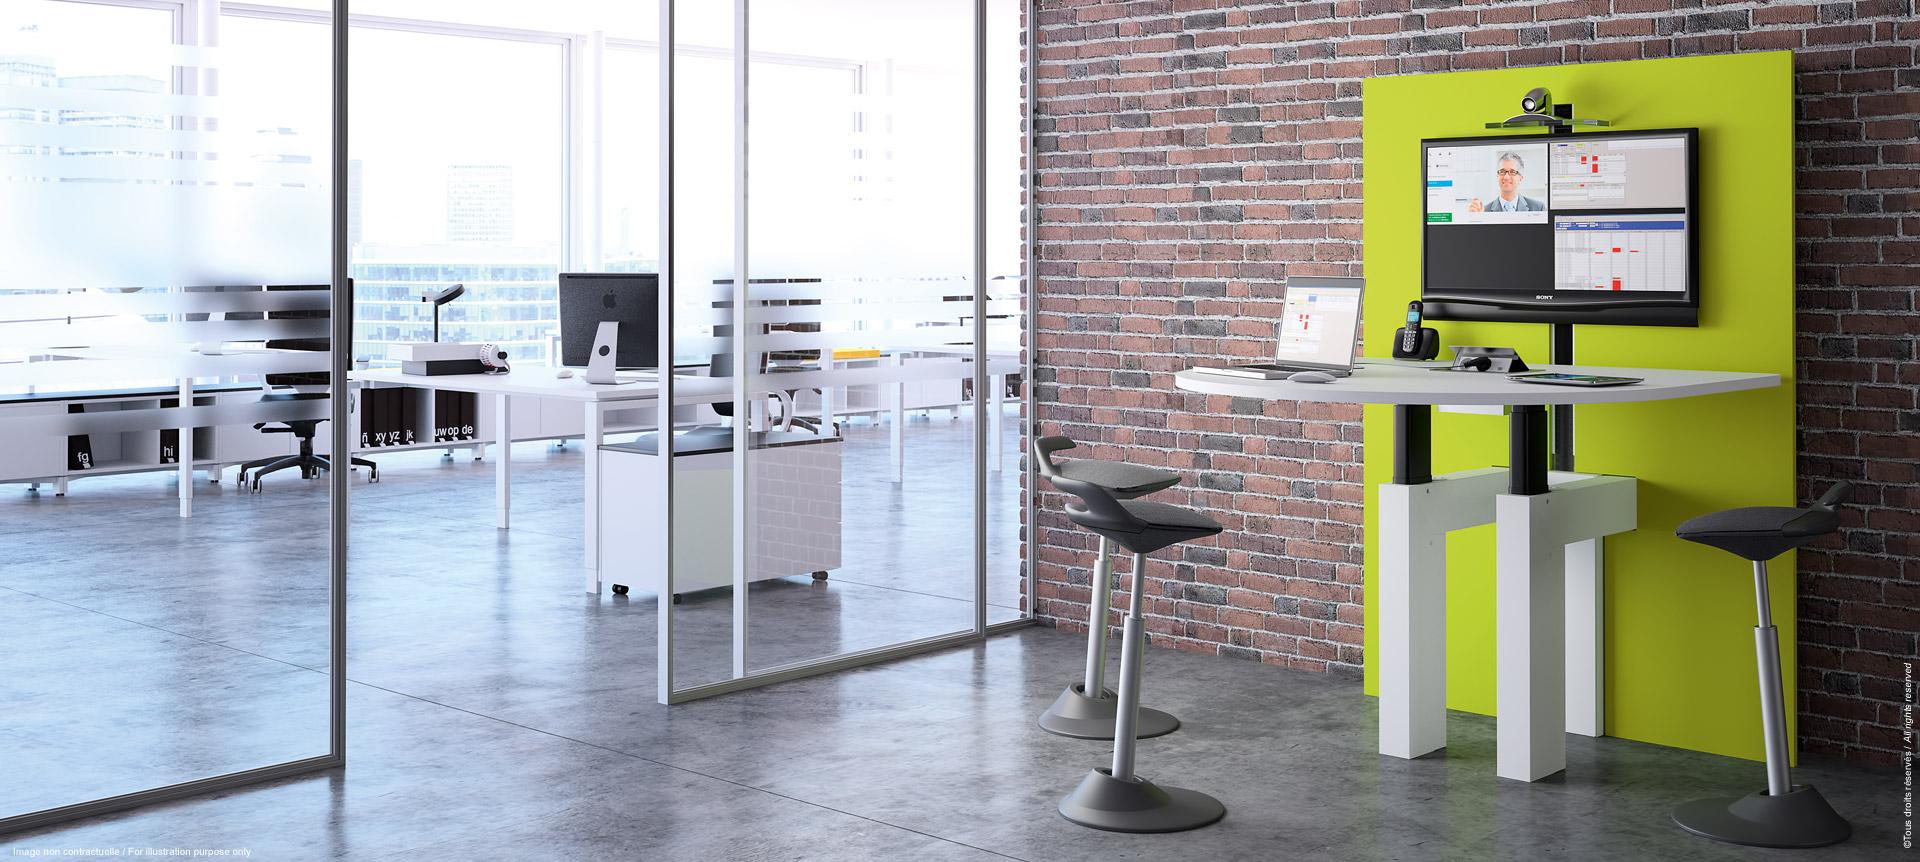 I-SHARE table de réunion multimédia ajustable en hauteur